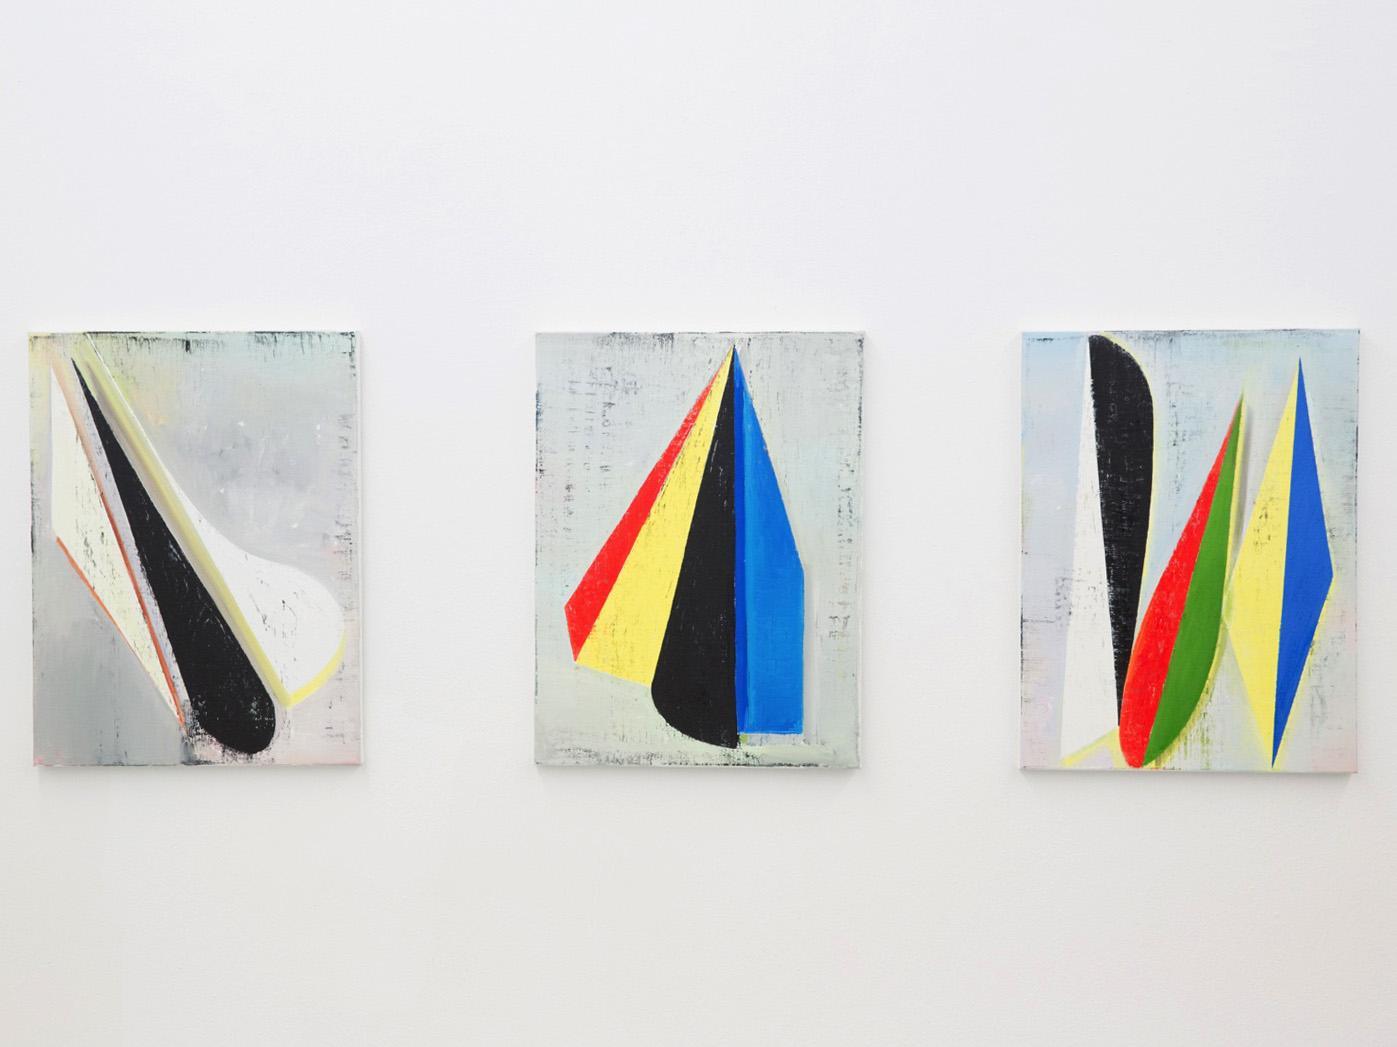 Artworks byGenti Korini Knoll Galerie curated byEdit Sasvari Photo:eSeL